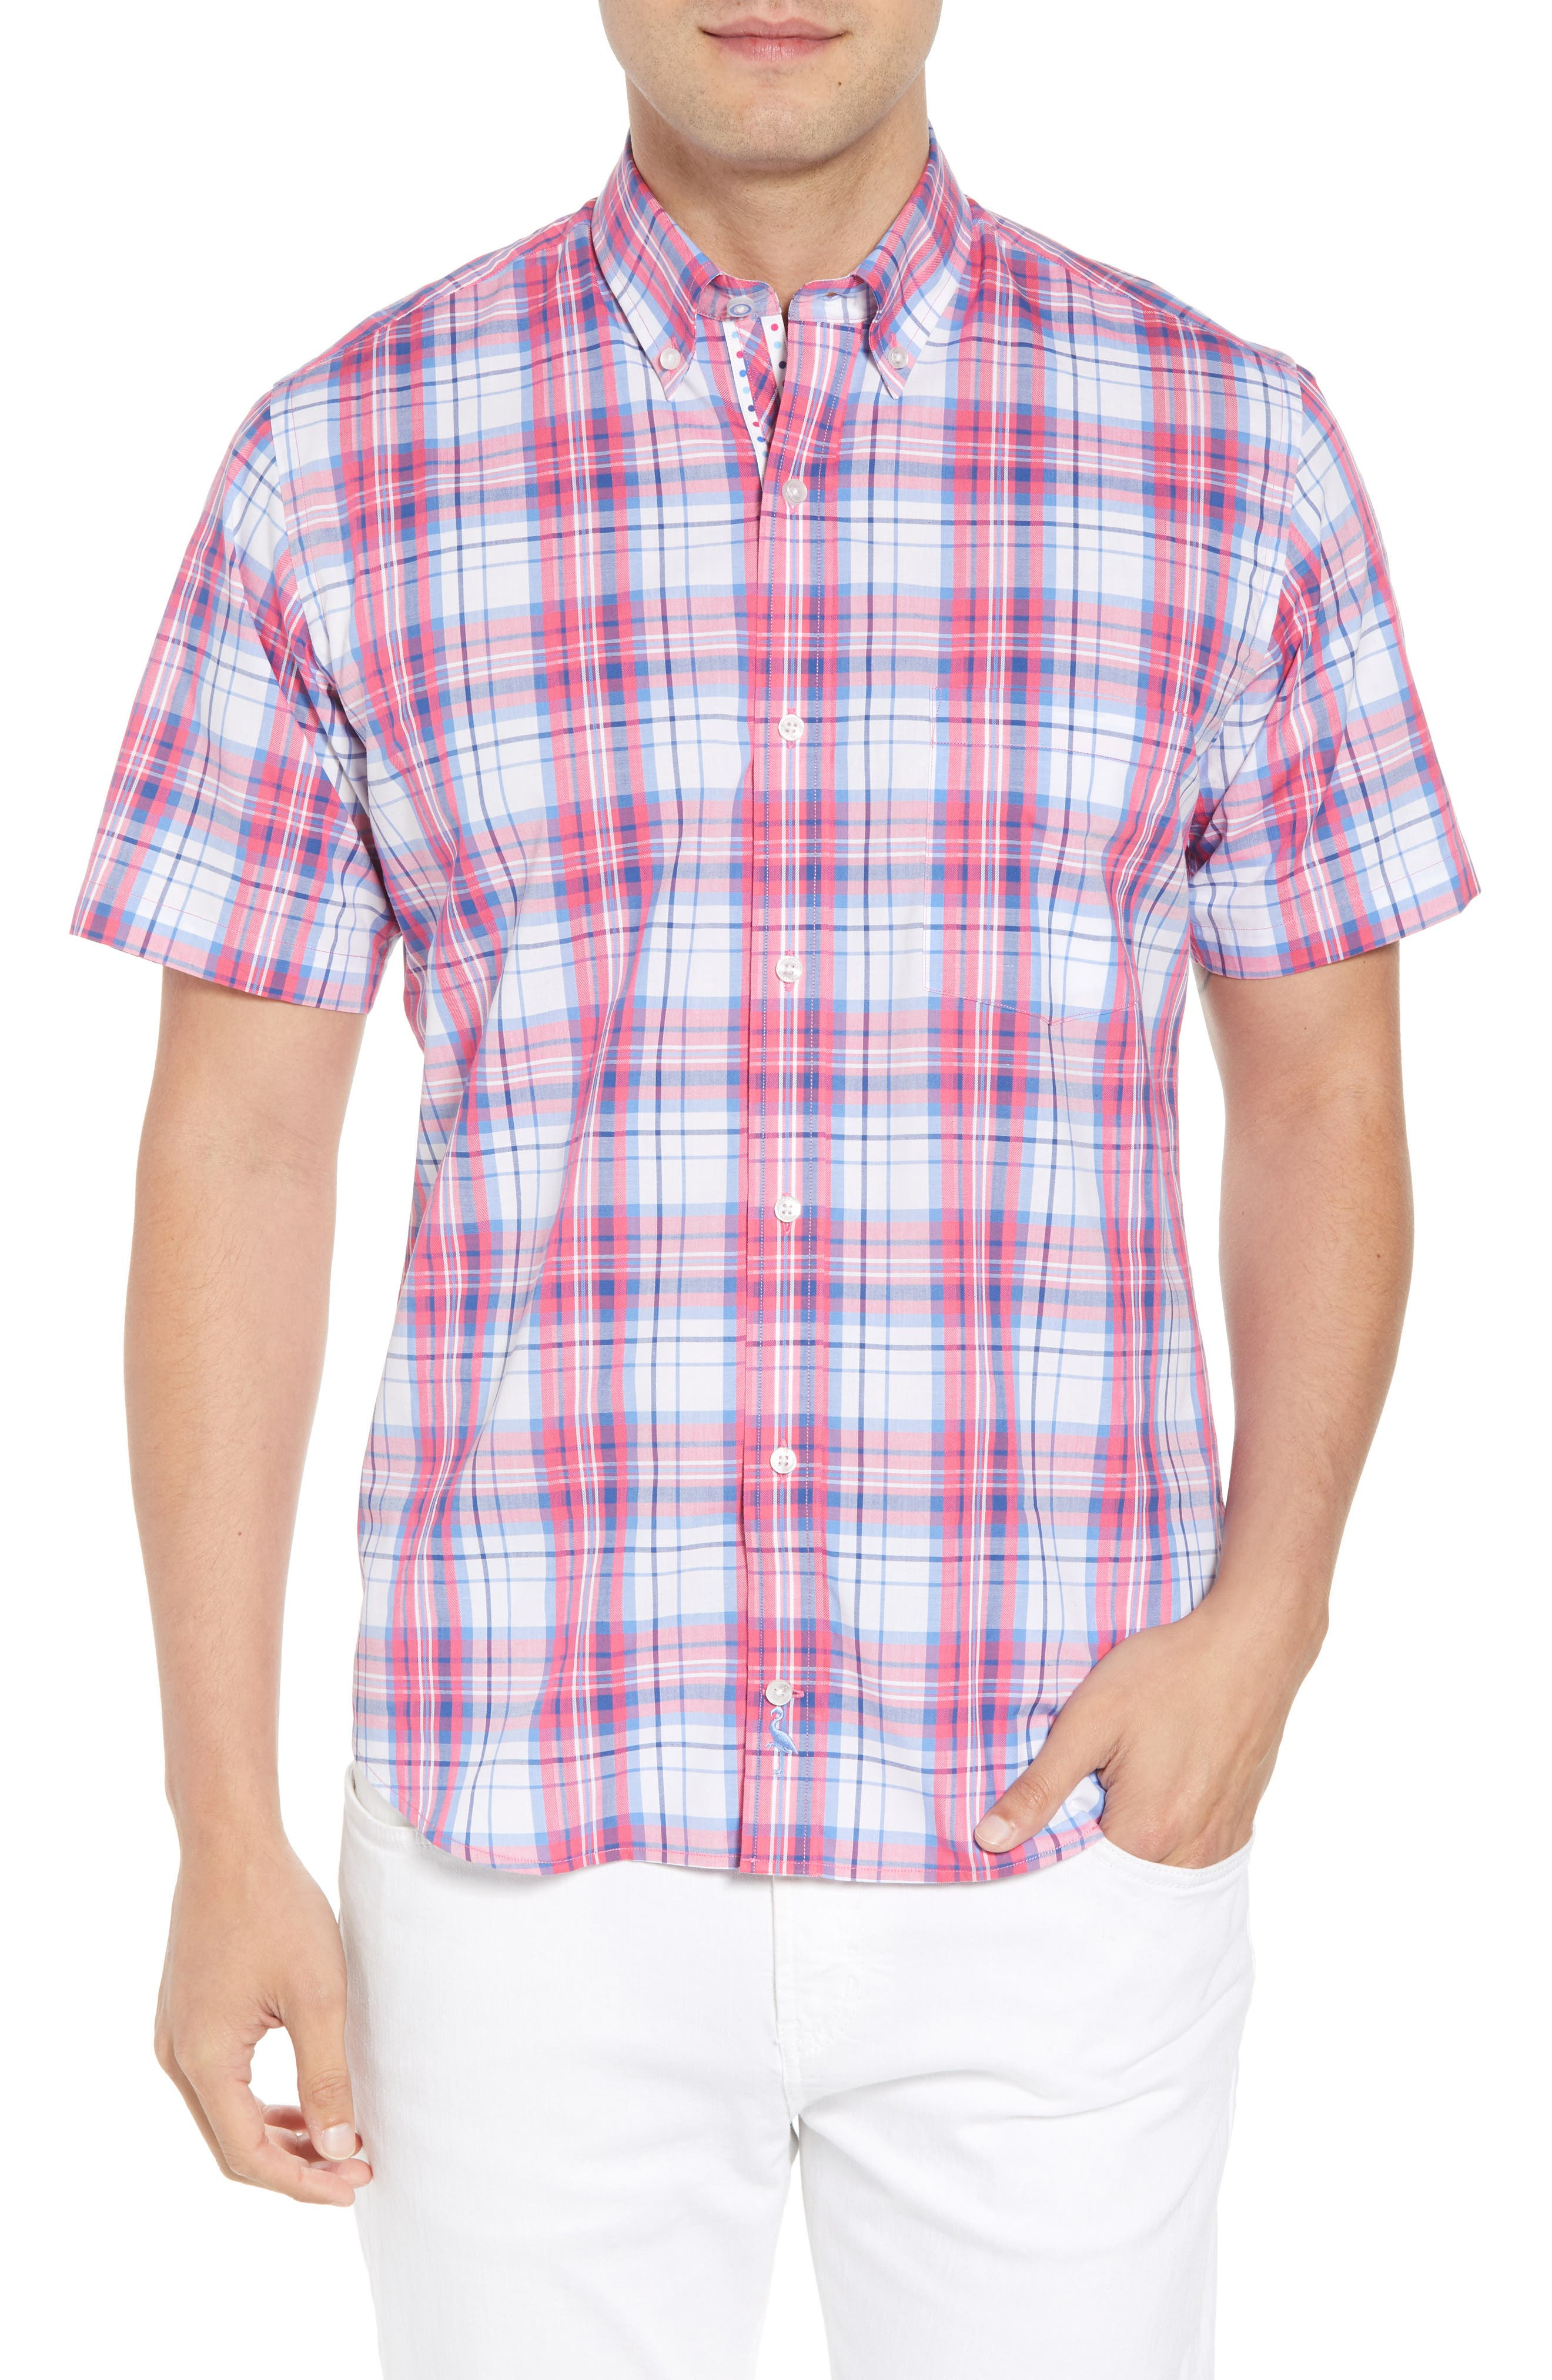 Alesso Regular Fit Plaid Sport Shirt,                             Main thumbnail 1, color,                             950